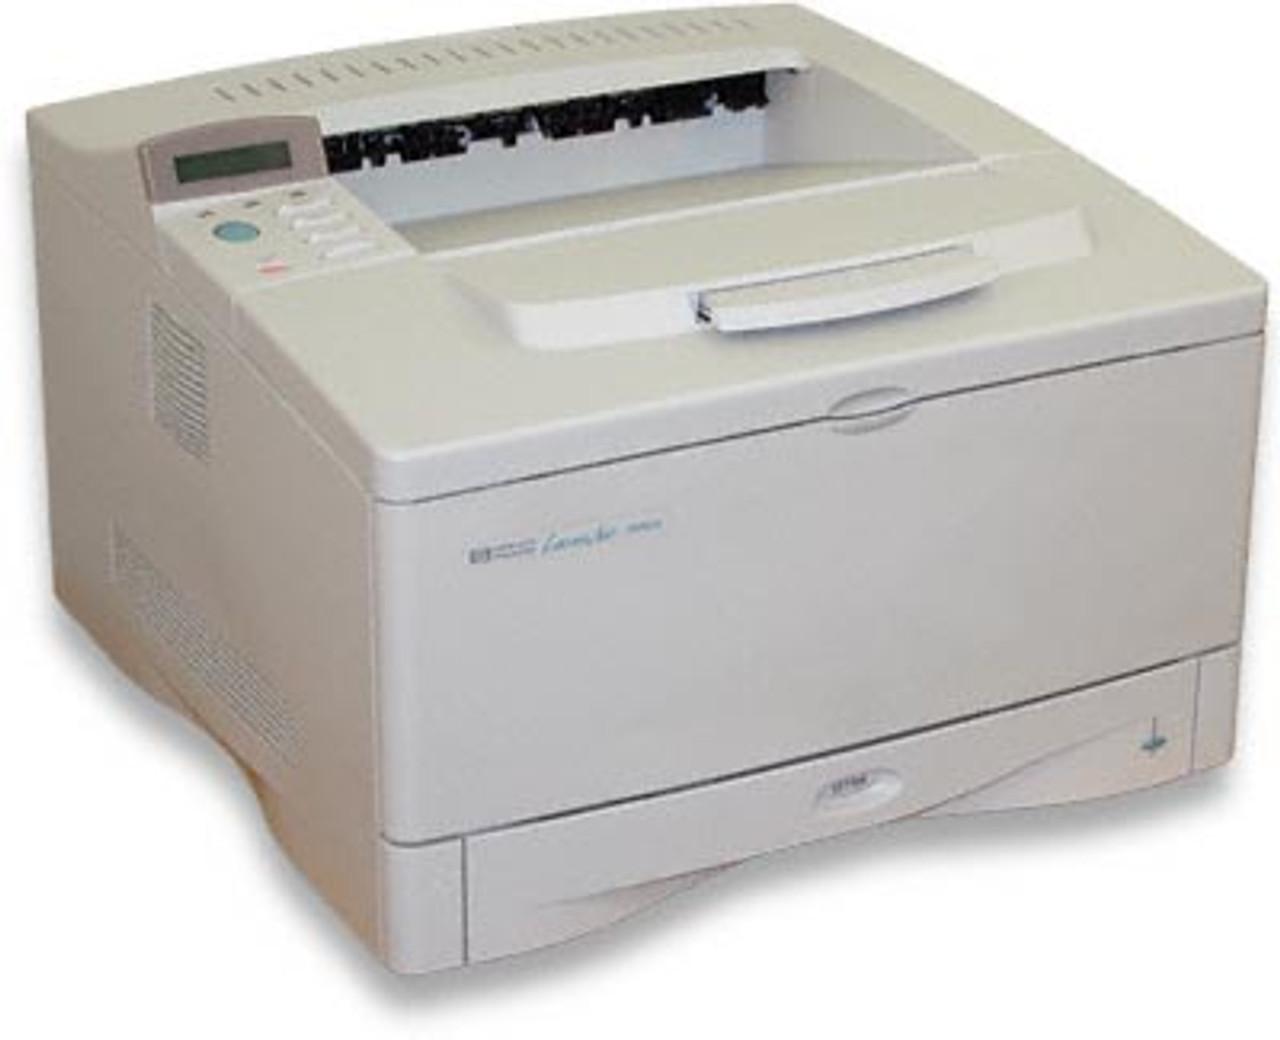 HP LaserJet 5000n - C4111A - HP 11x17 Laser Printer for sale